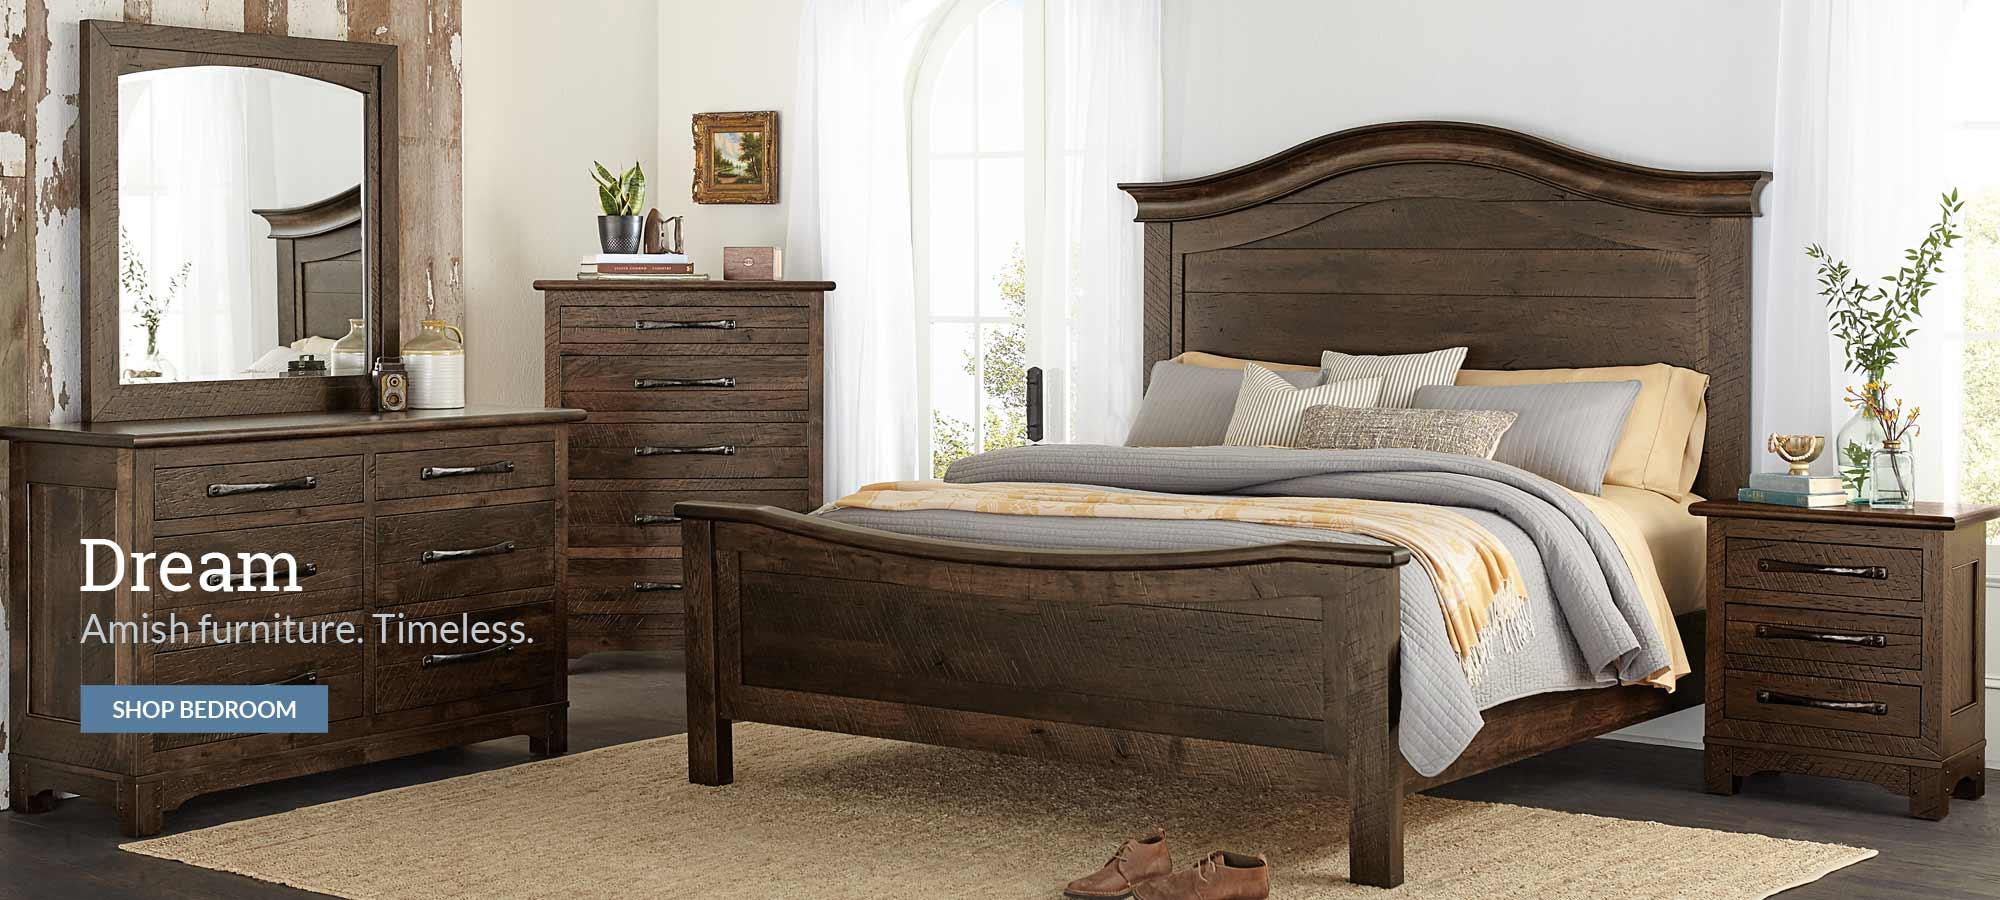 Mattie Lu - Amish Solid Wood Bedroom Furniture